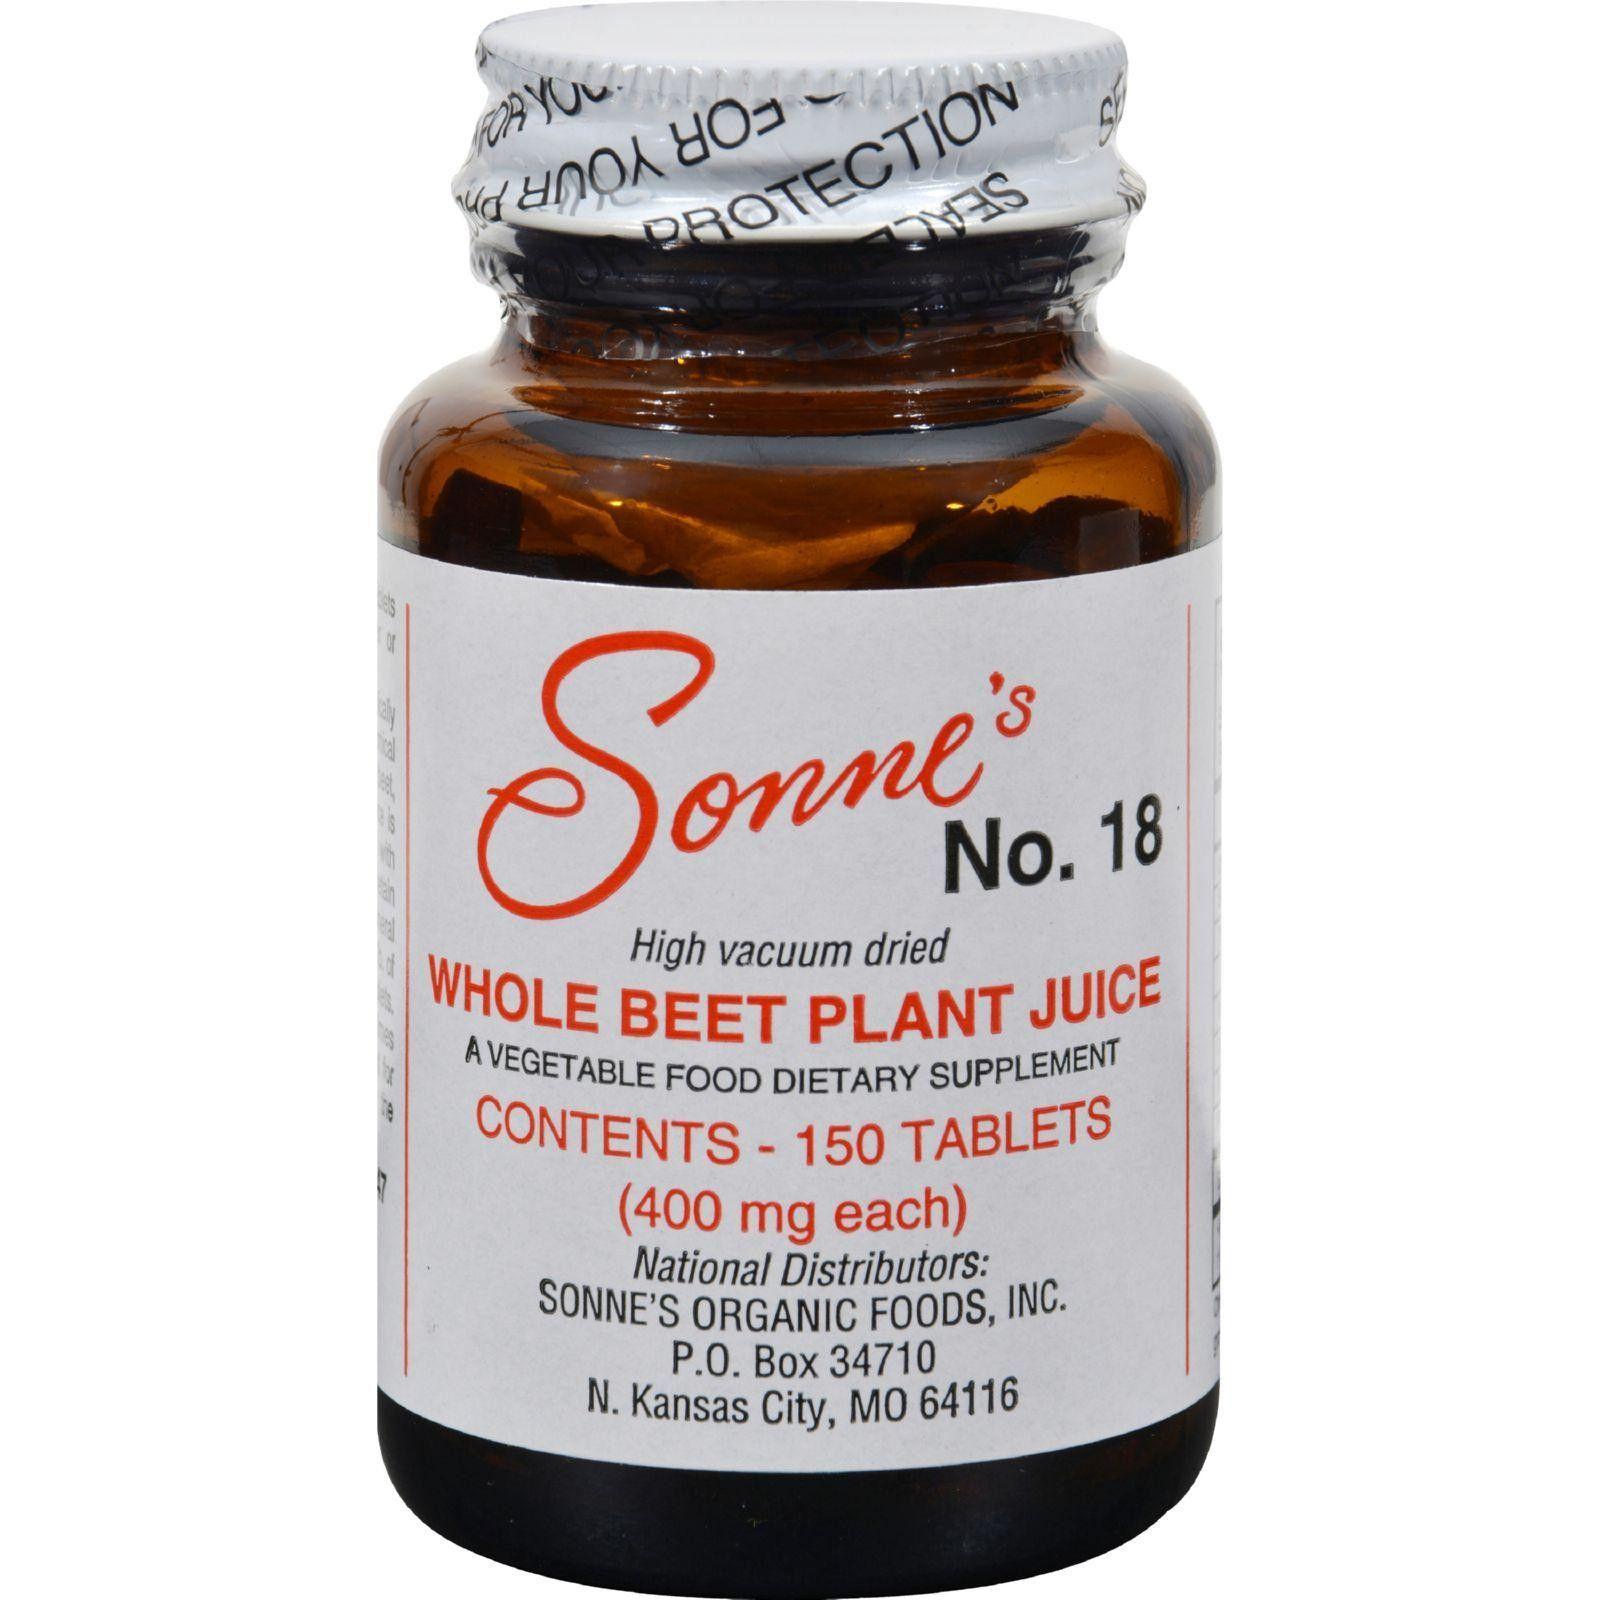 Sonneus Whole Beet Plant Juice No Mg Tablets Beet